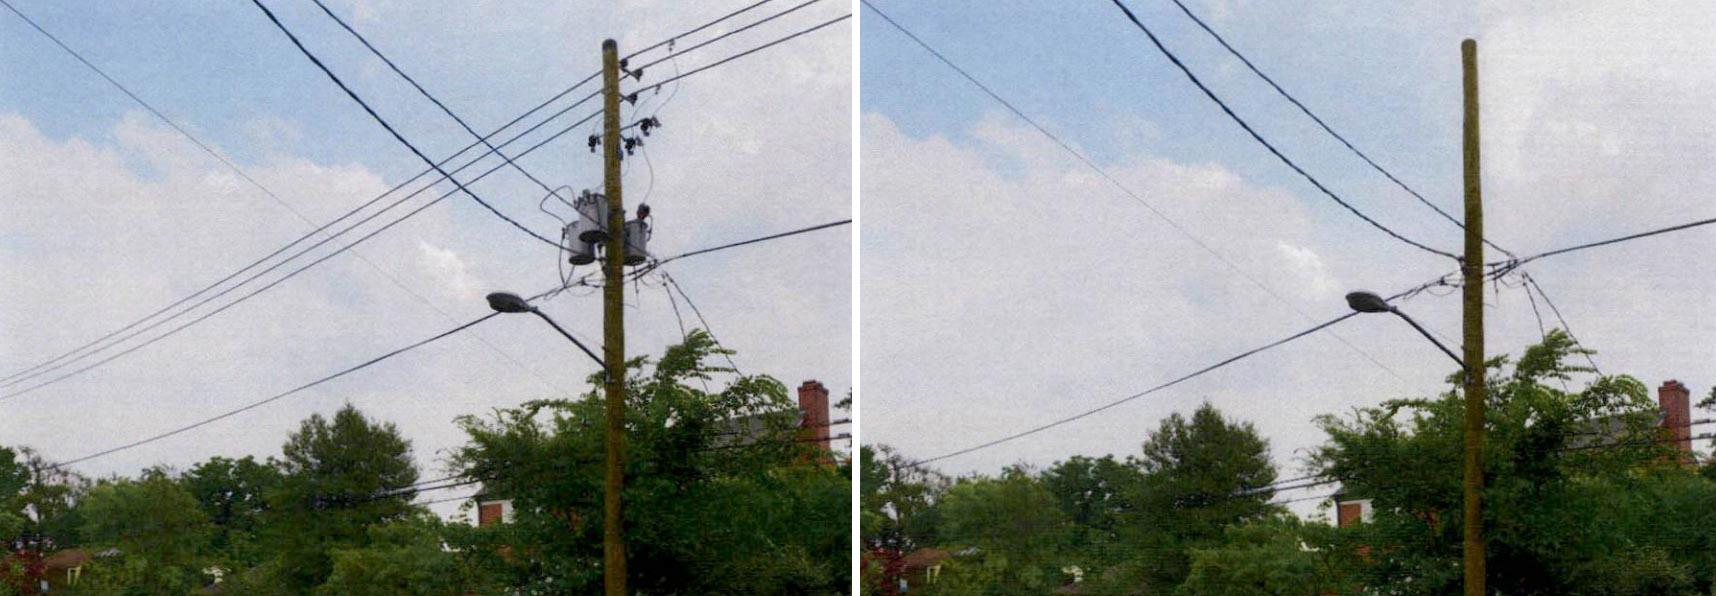 Bury power lines under streets, not sidewalks – Greater Greater ...